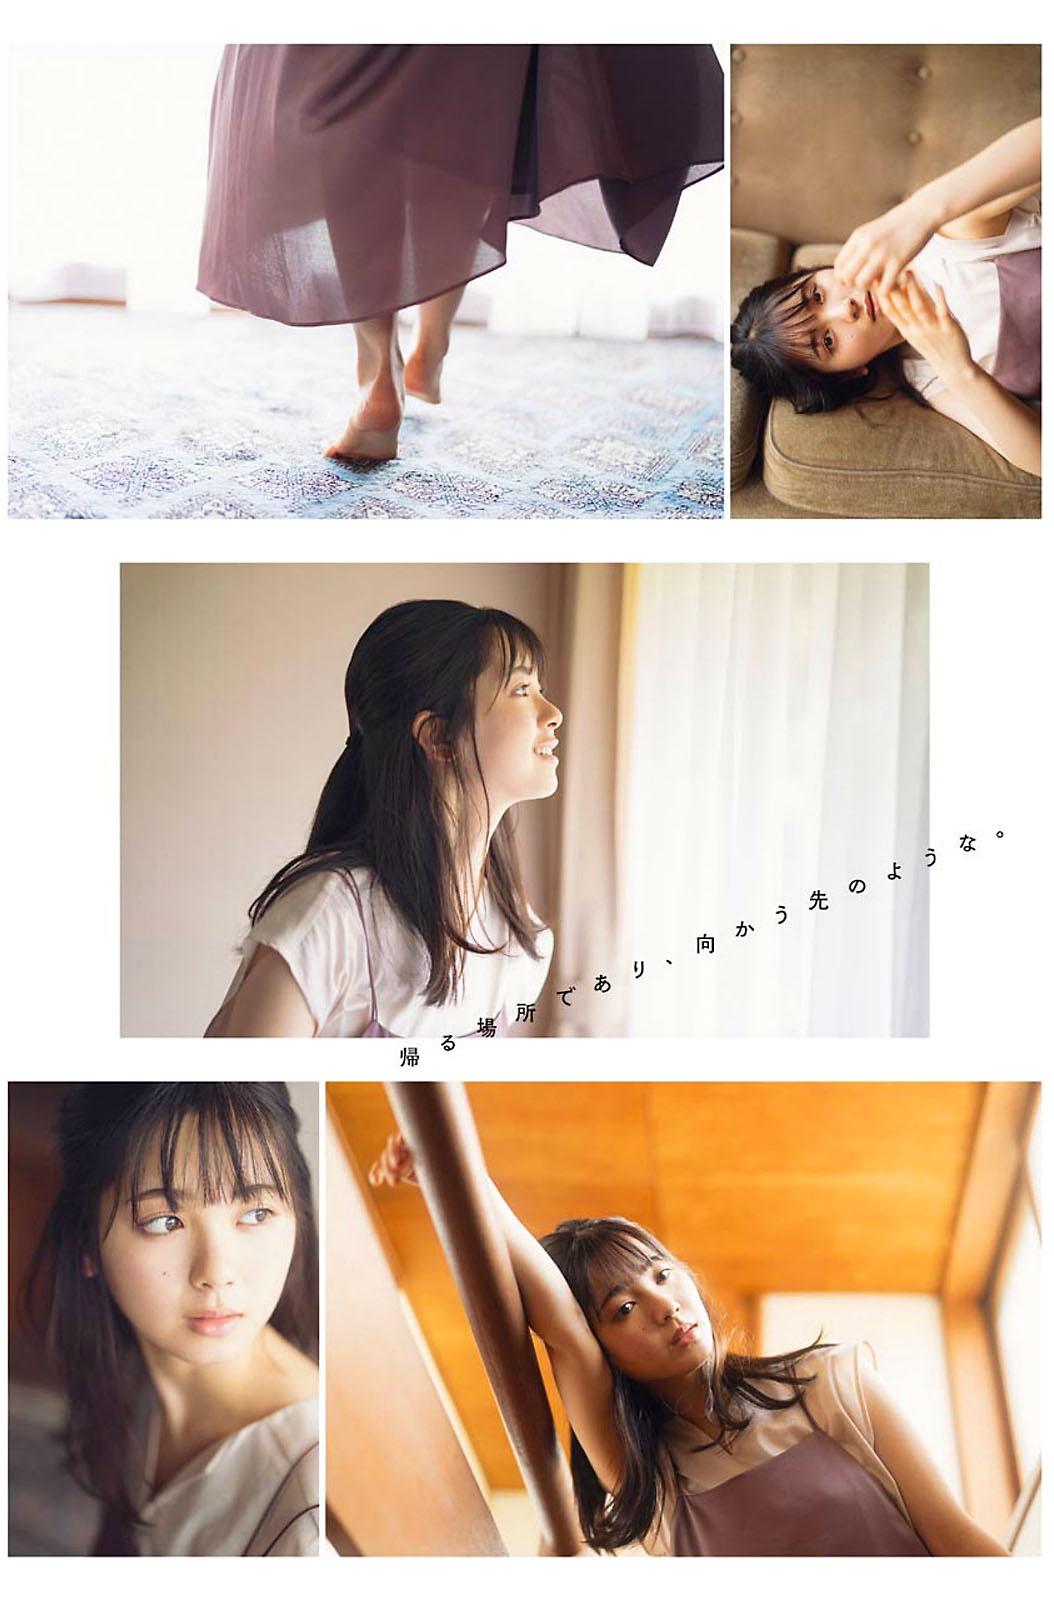 Tsutsue Auame Young Gangan 210917 10.jpg